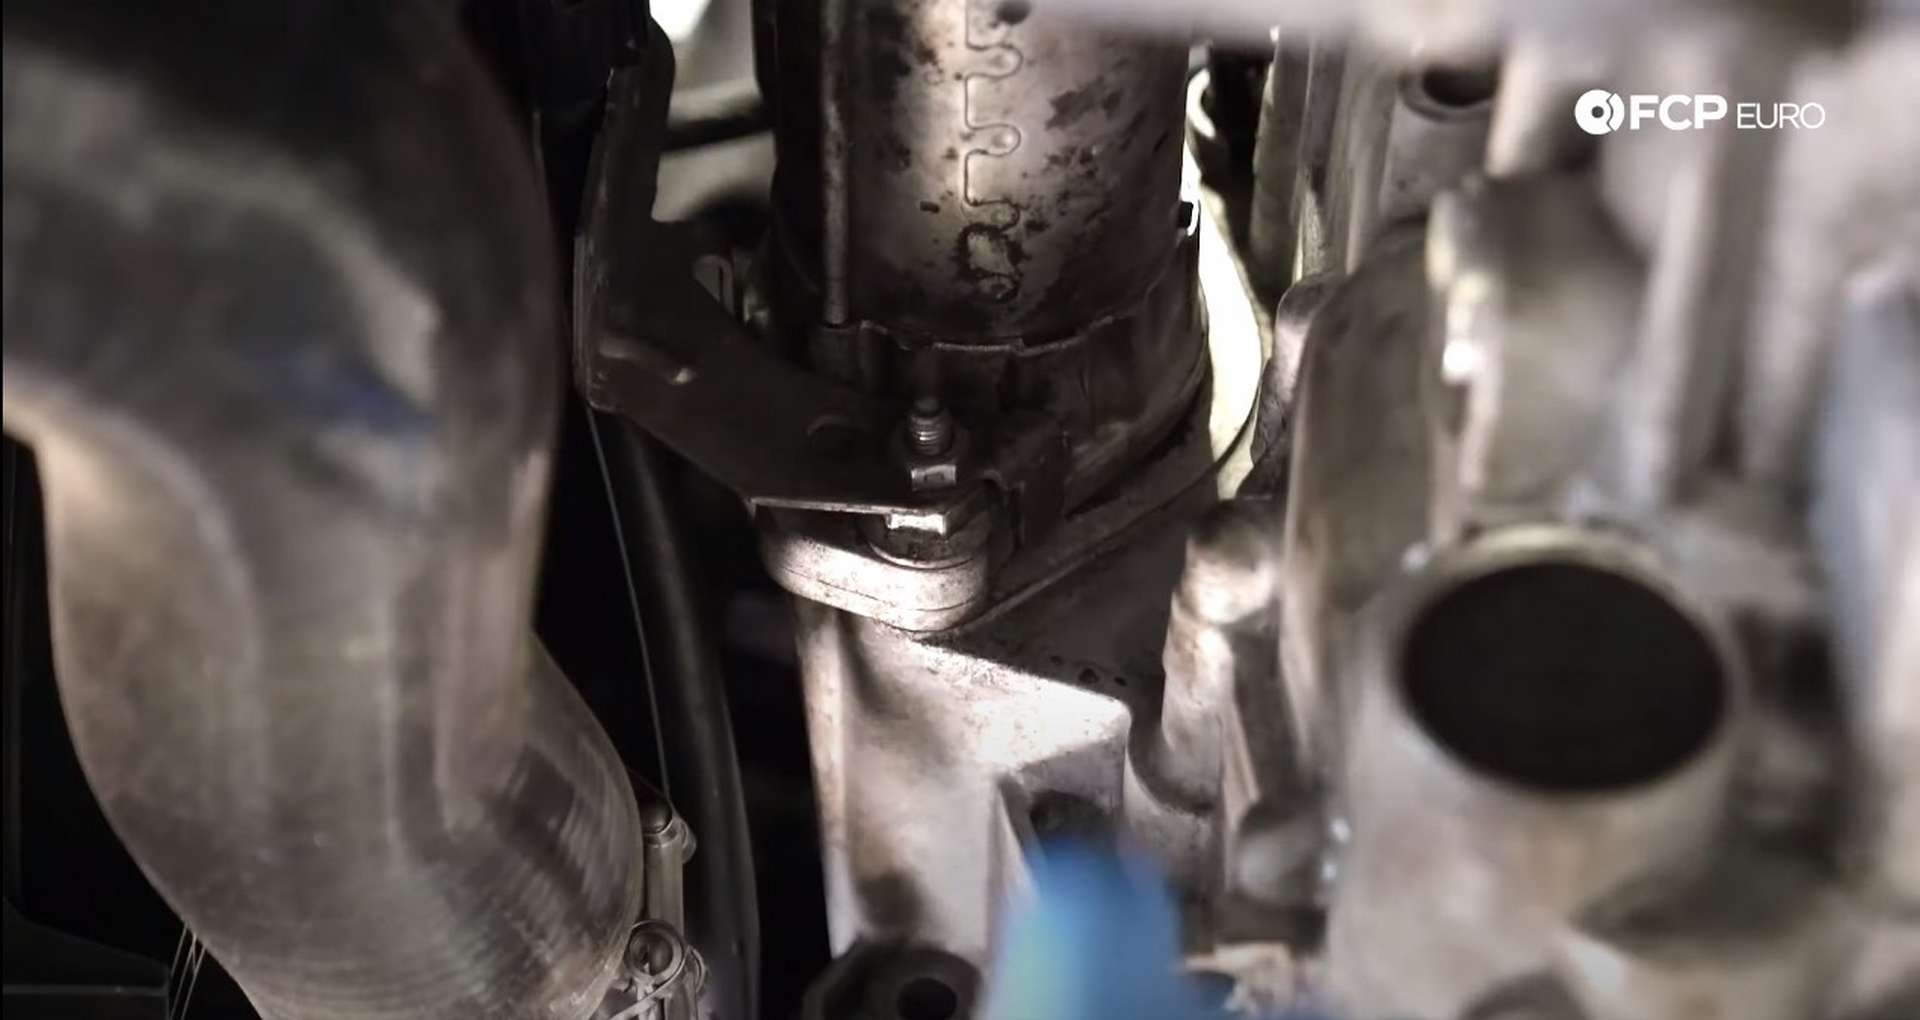 21-DIY_VW_GTI_Clutch-Job-Draining-Fluids